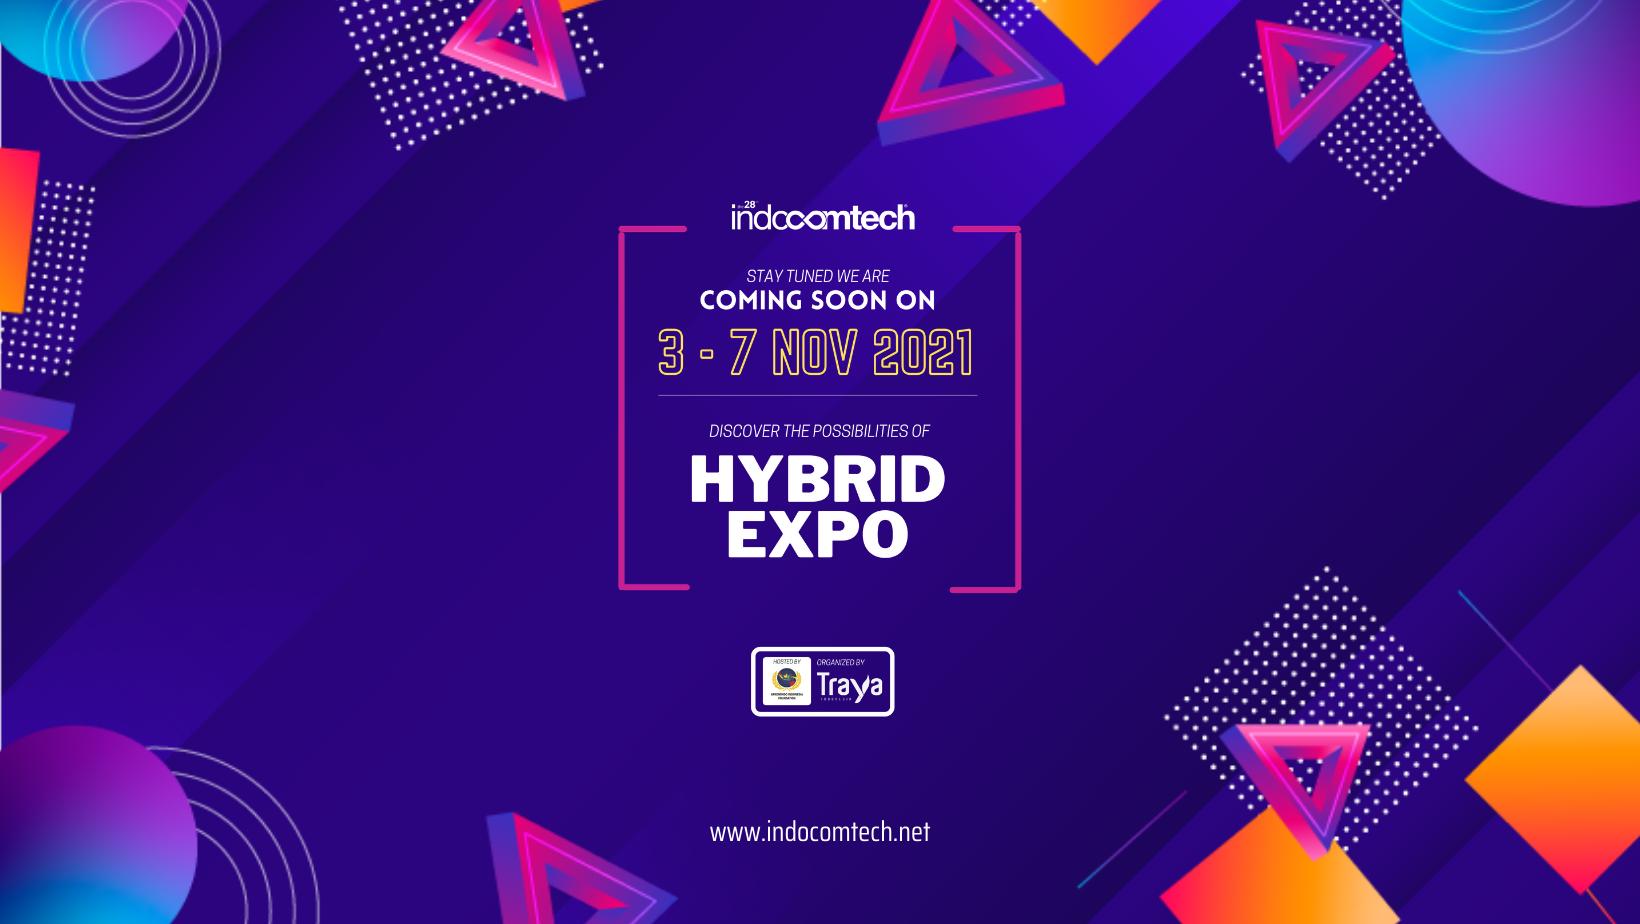 Indocomtech 2021 - HYBRID EXPO